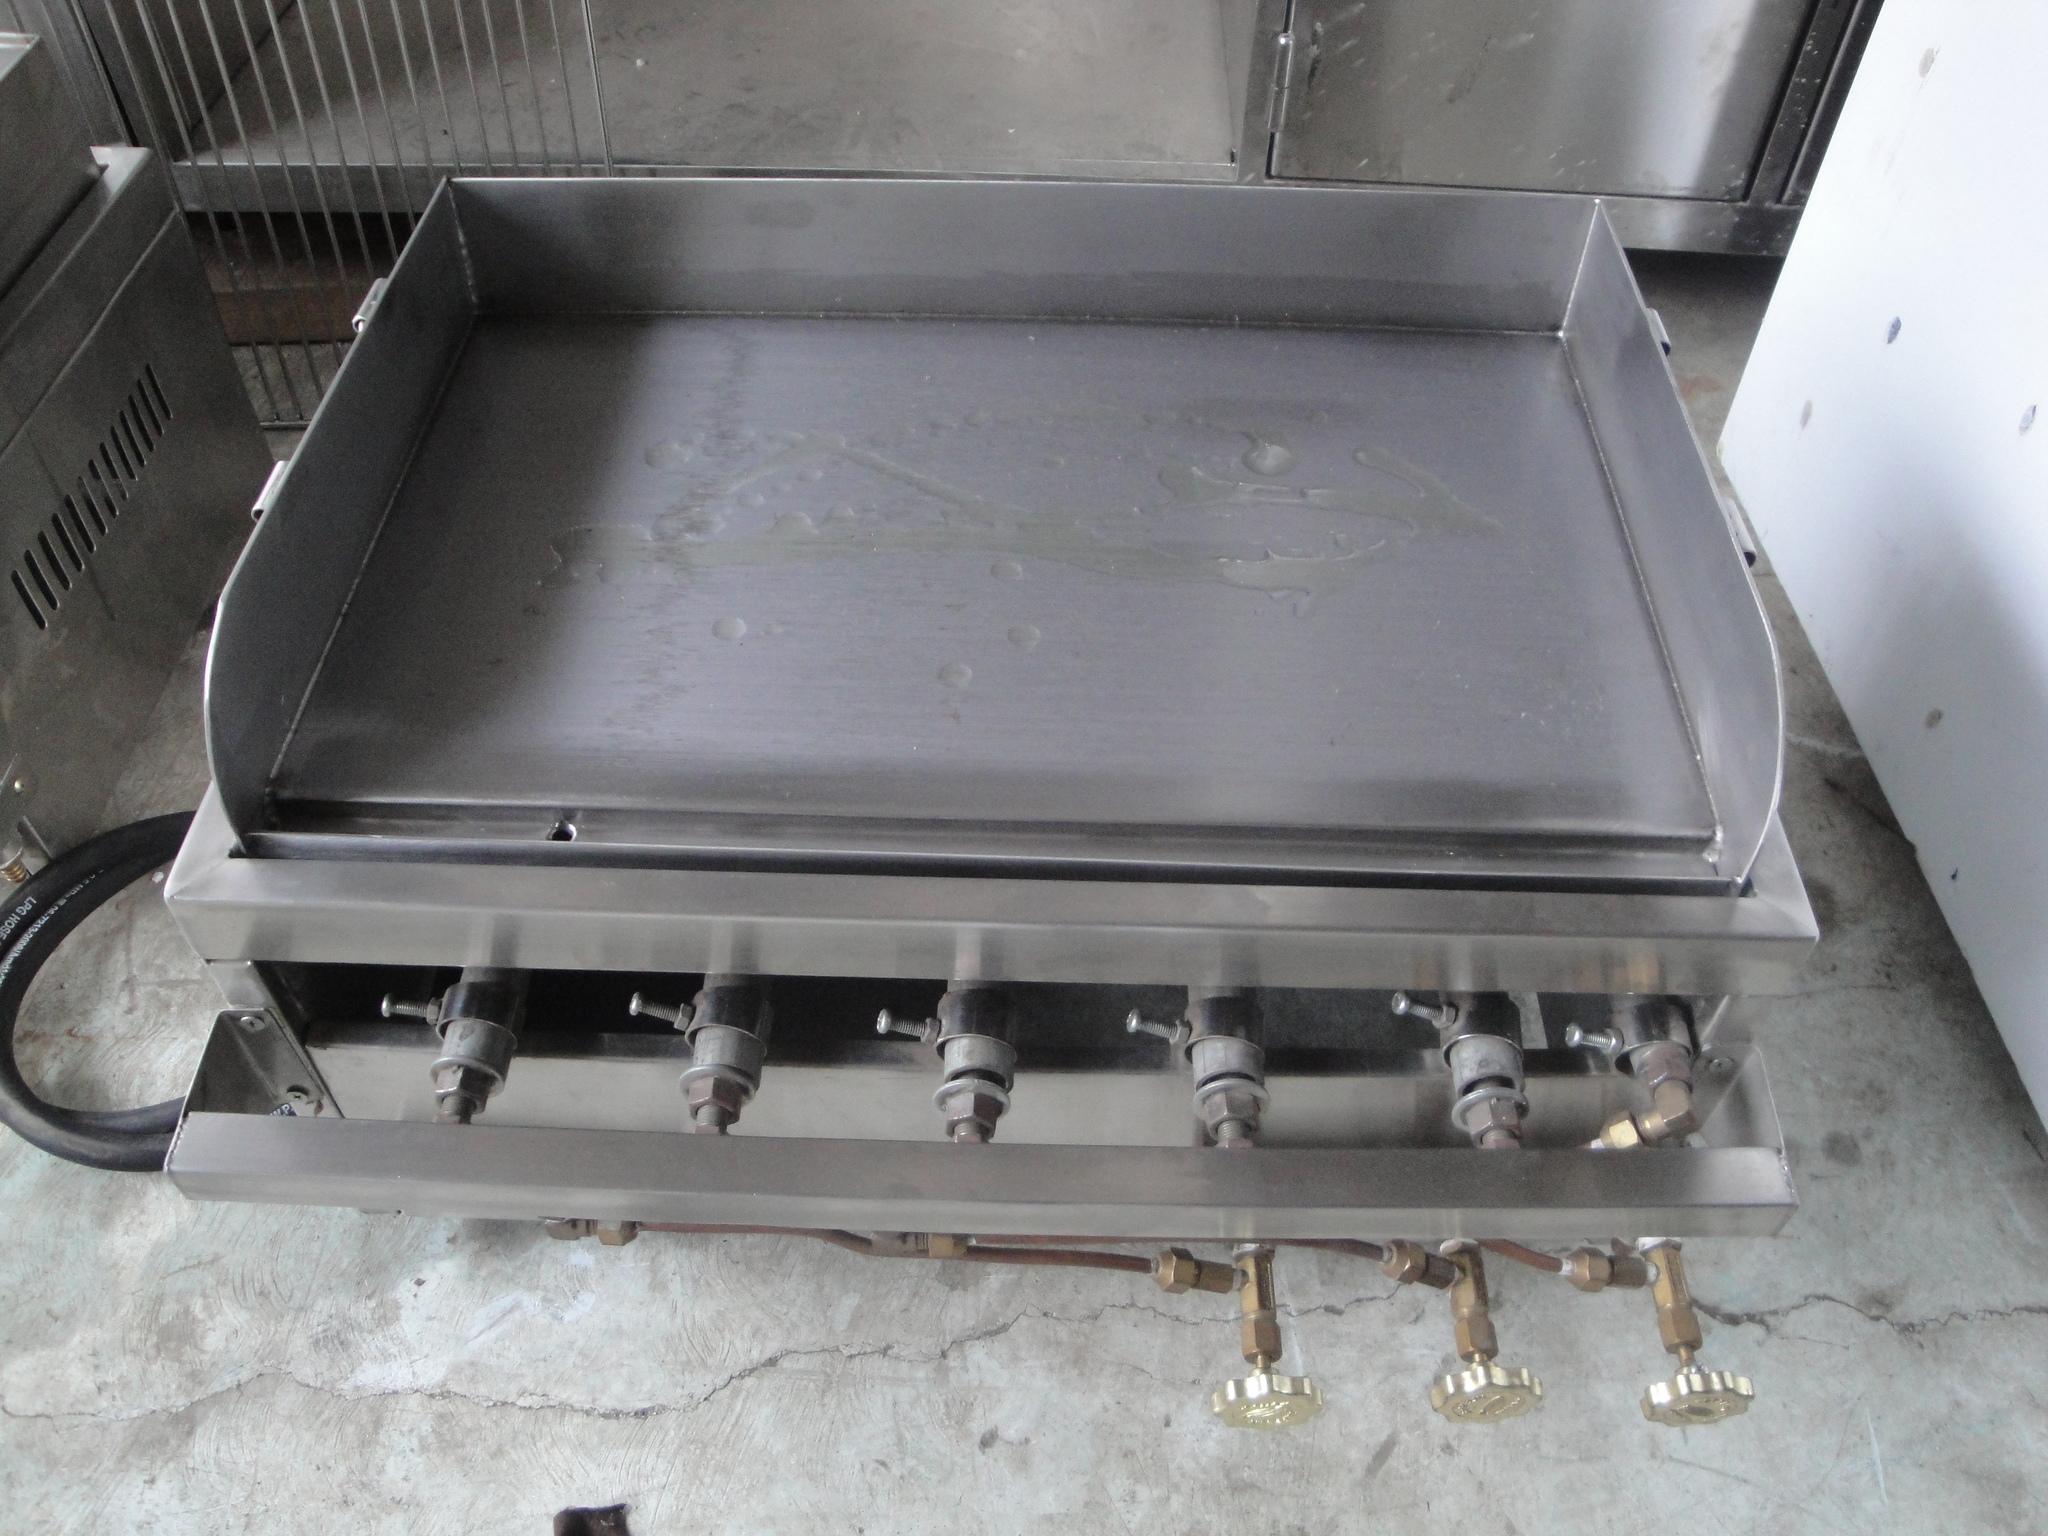 Jual Griddle Gas Tepanyaki Portable Burger Grill Flat Top Fen Online Tokopedia